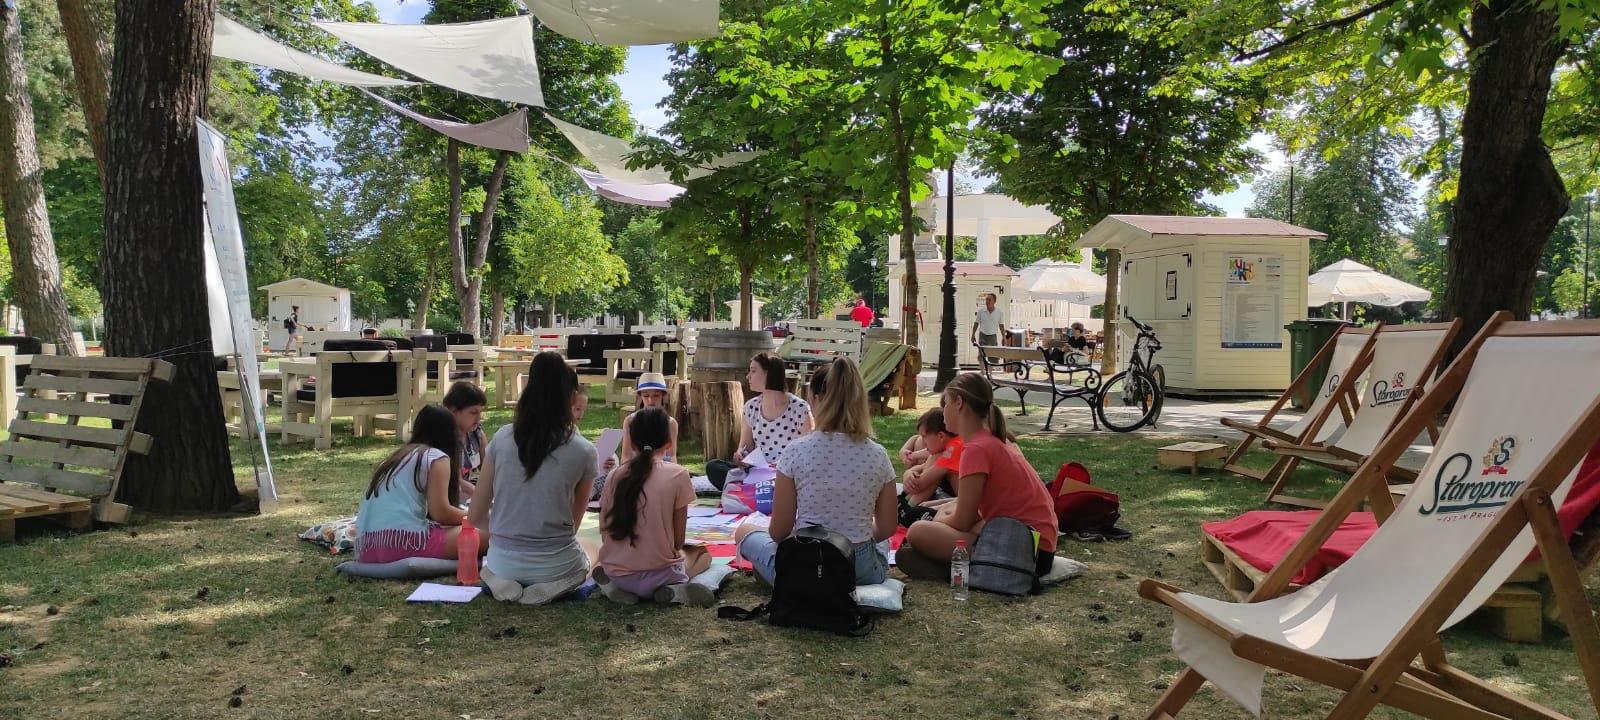 bjelovarsko kulturno ljeto 4